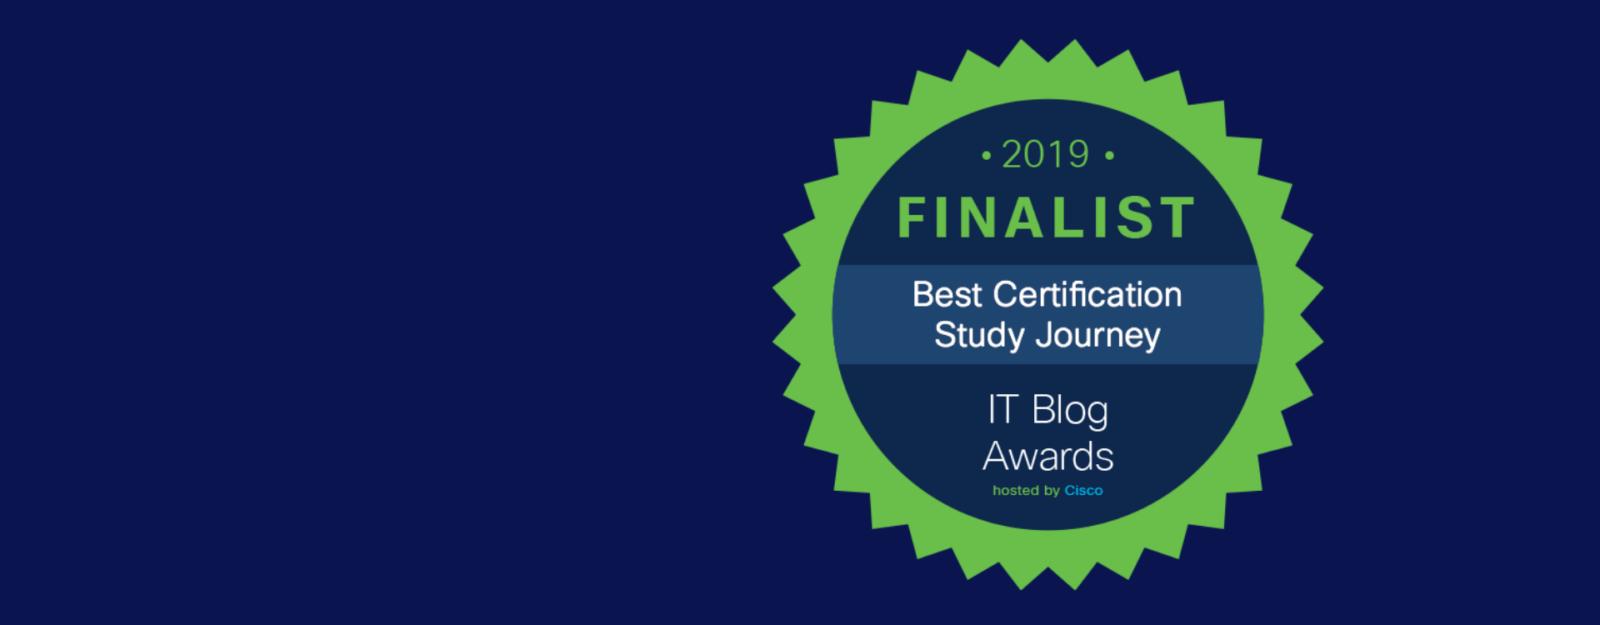 cisco-it-blog-awards-IPCisco